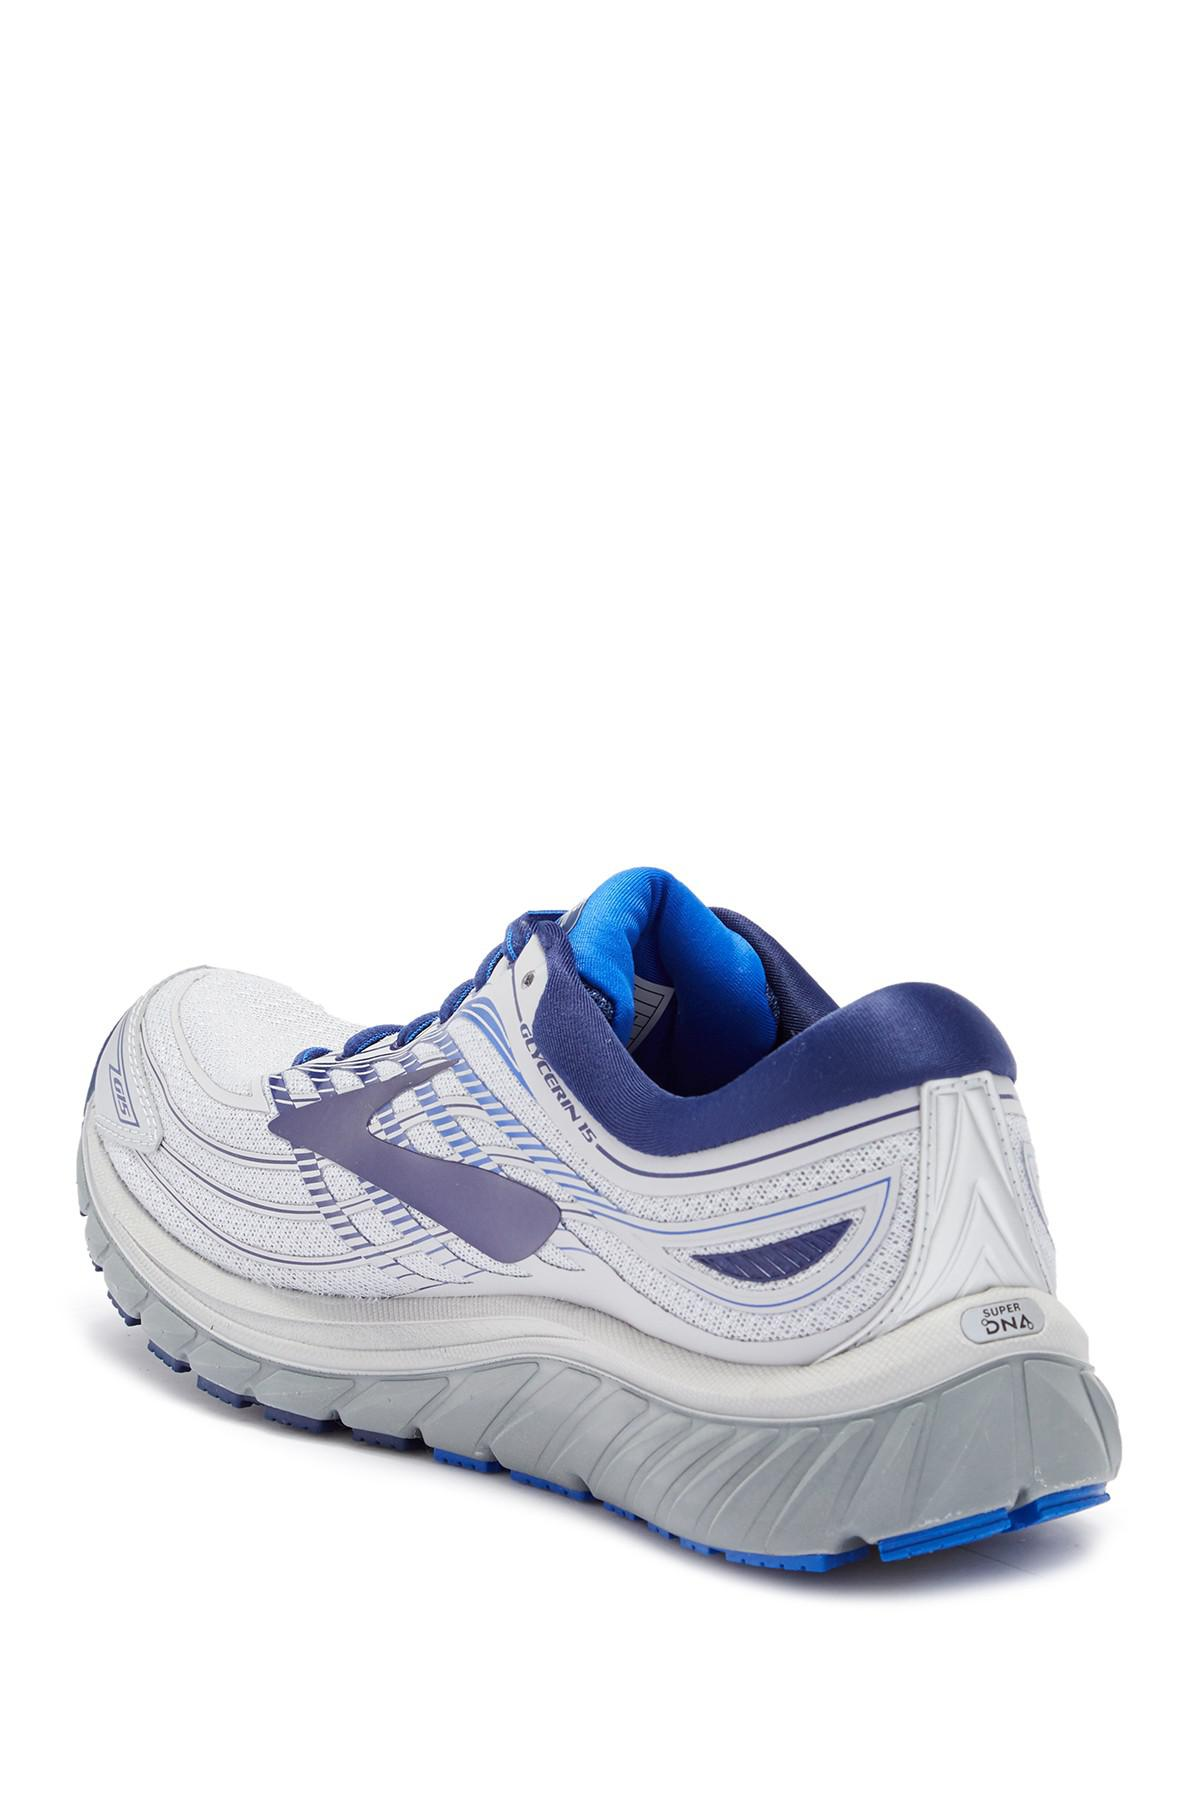 edb5297fedb77 Brooks - Blue Glycerin 15 Running Sneaker for Men - Lyst. View fullscreen